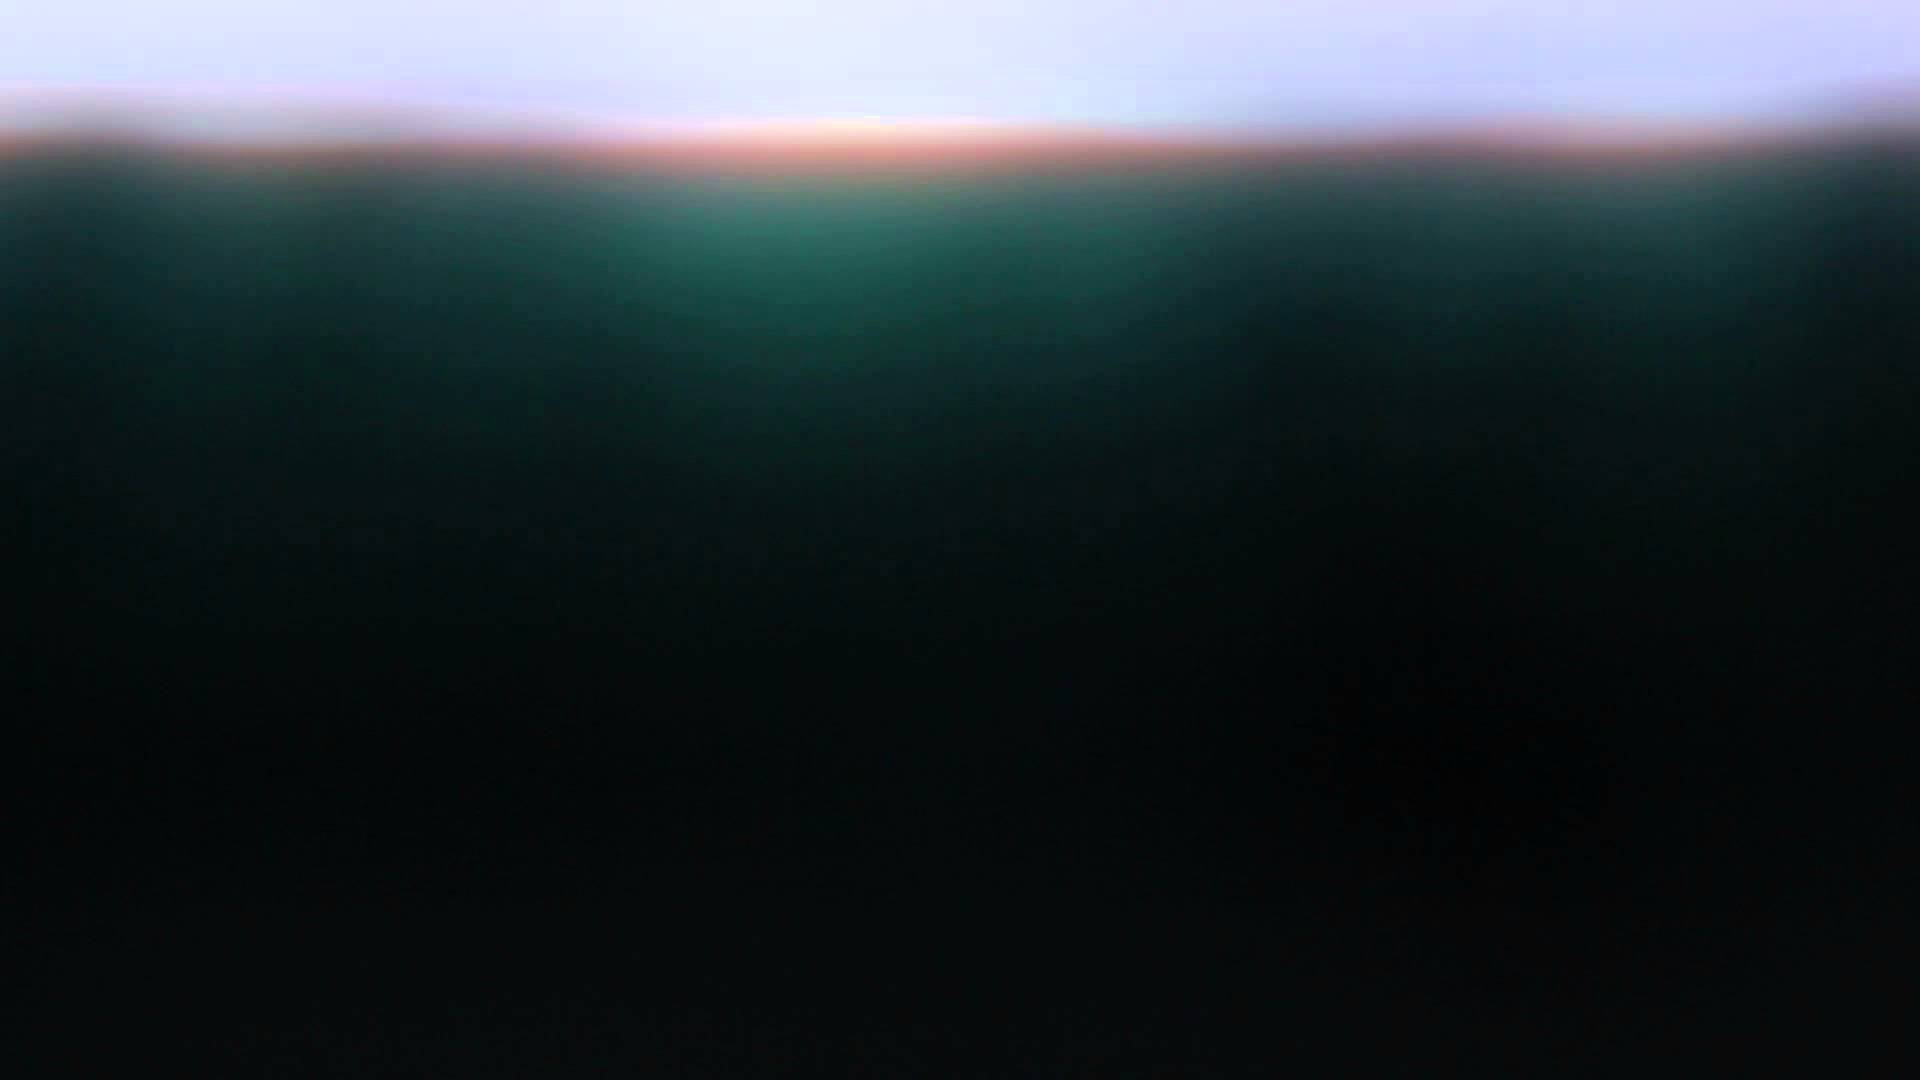 Green Nature Wallpaper Hd Big Stripes Vhs Tape Glitch Stock Footage Hd Tv